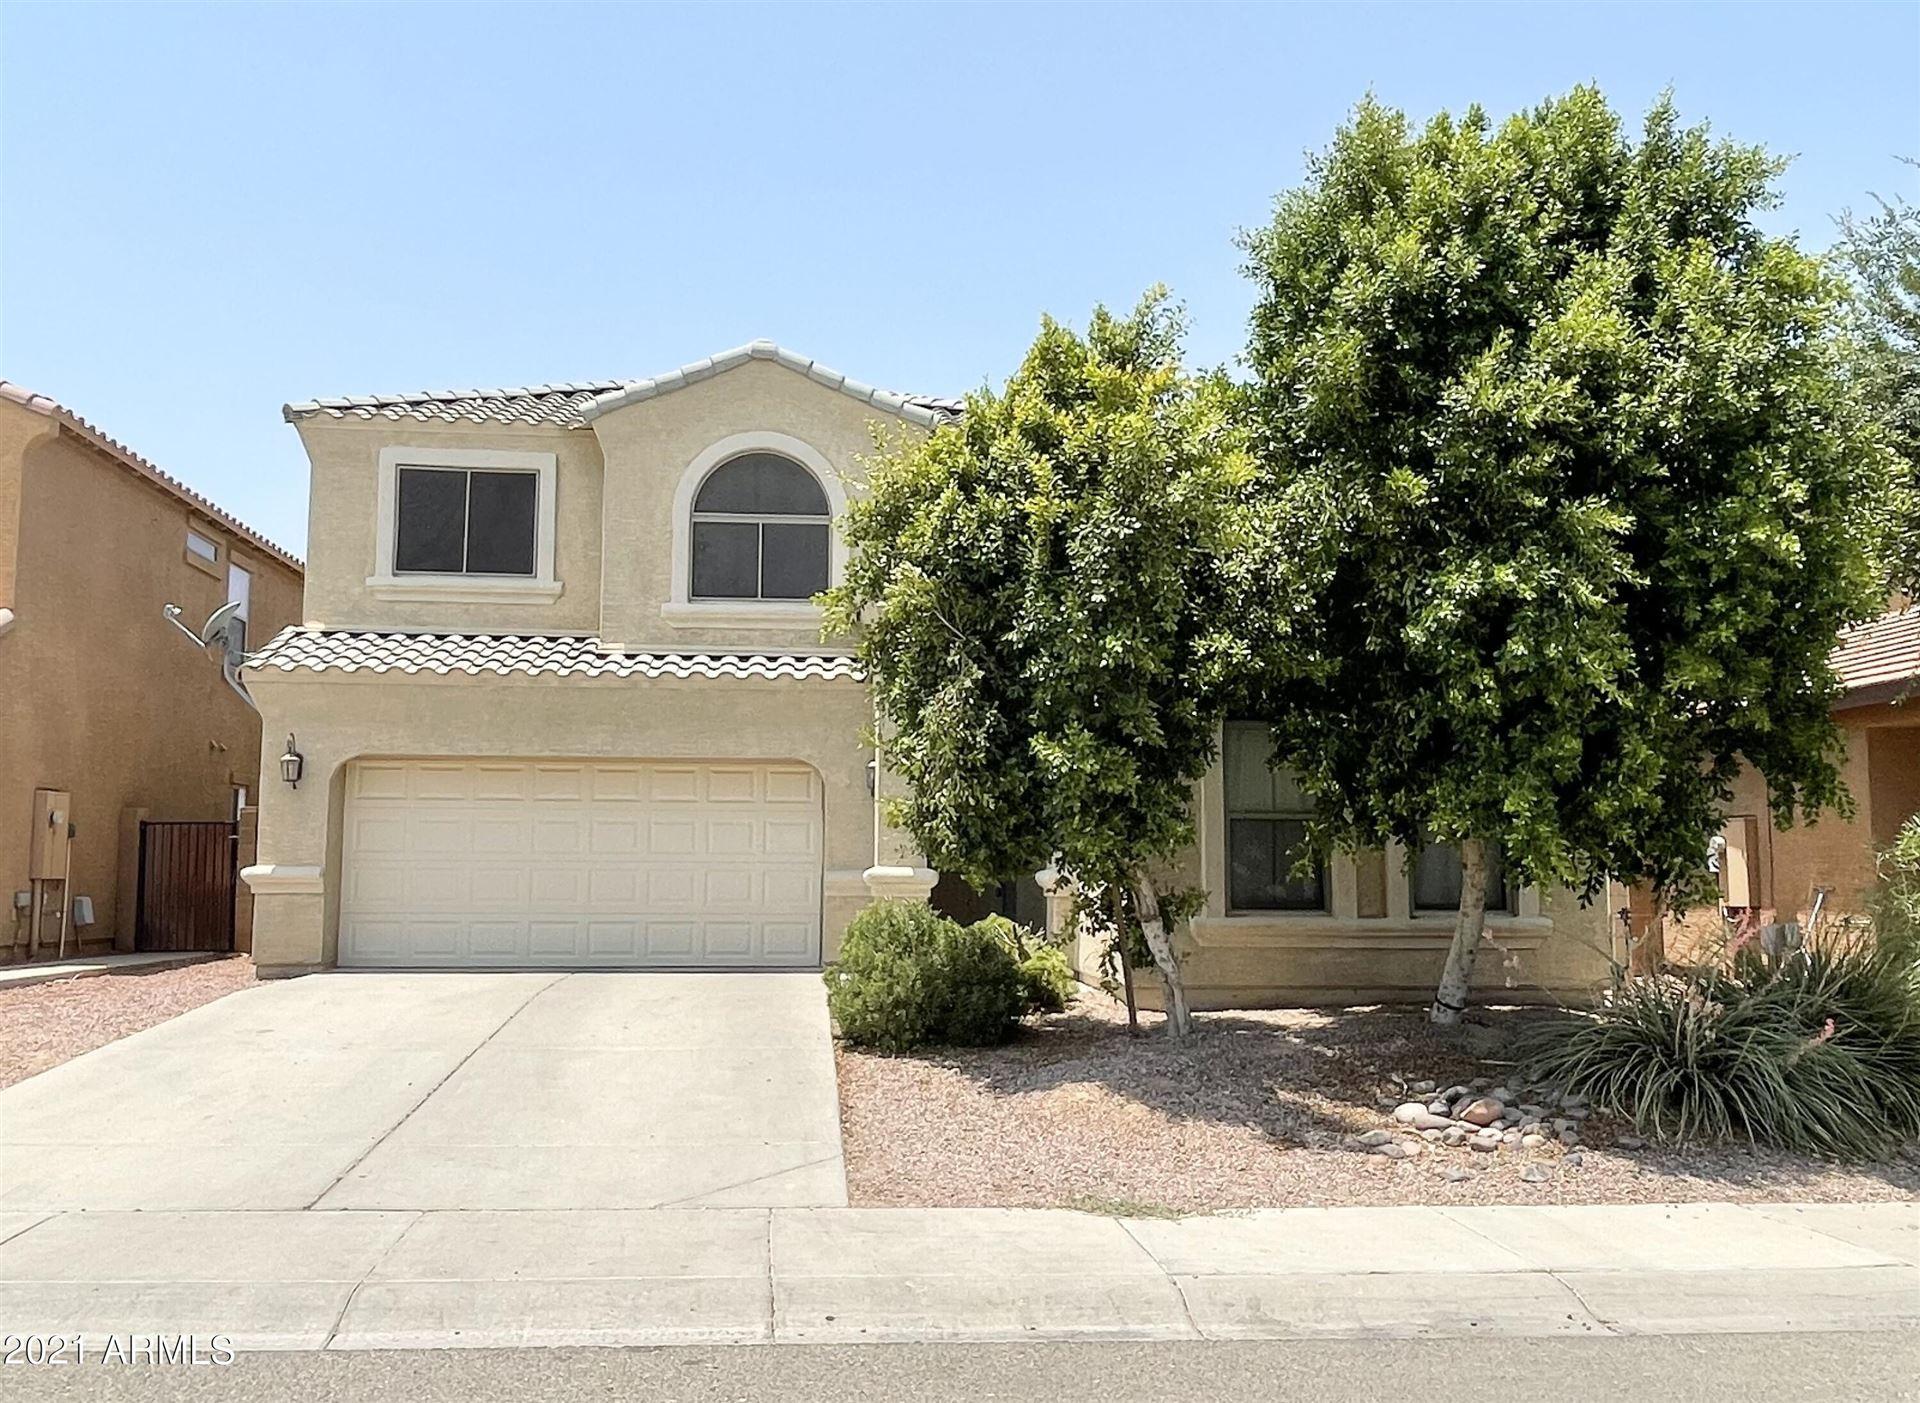 Photo of 4008 S 104TH Lane, Tolleson, AZ 85353 (MLS # 6263198)